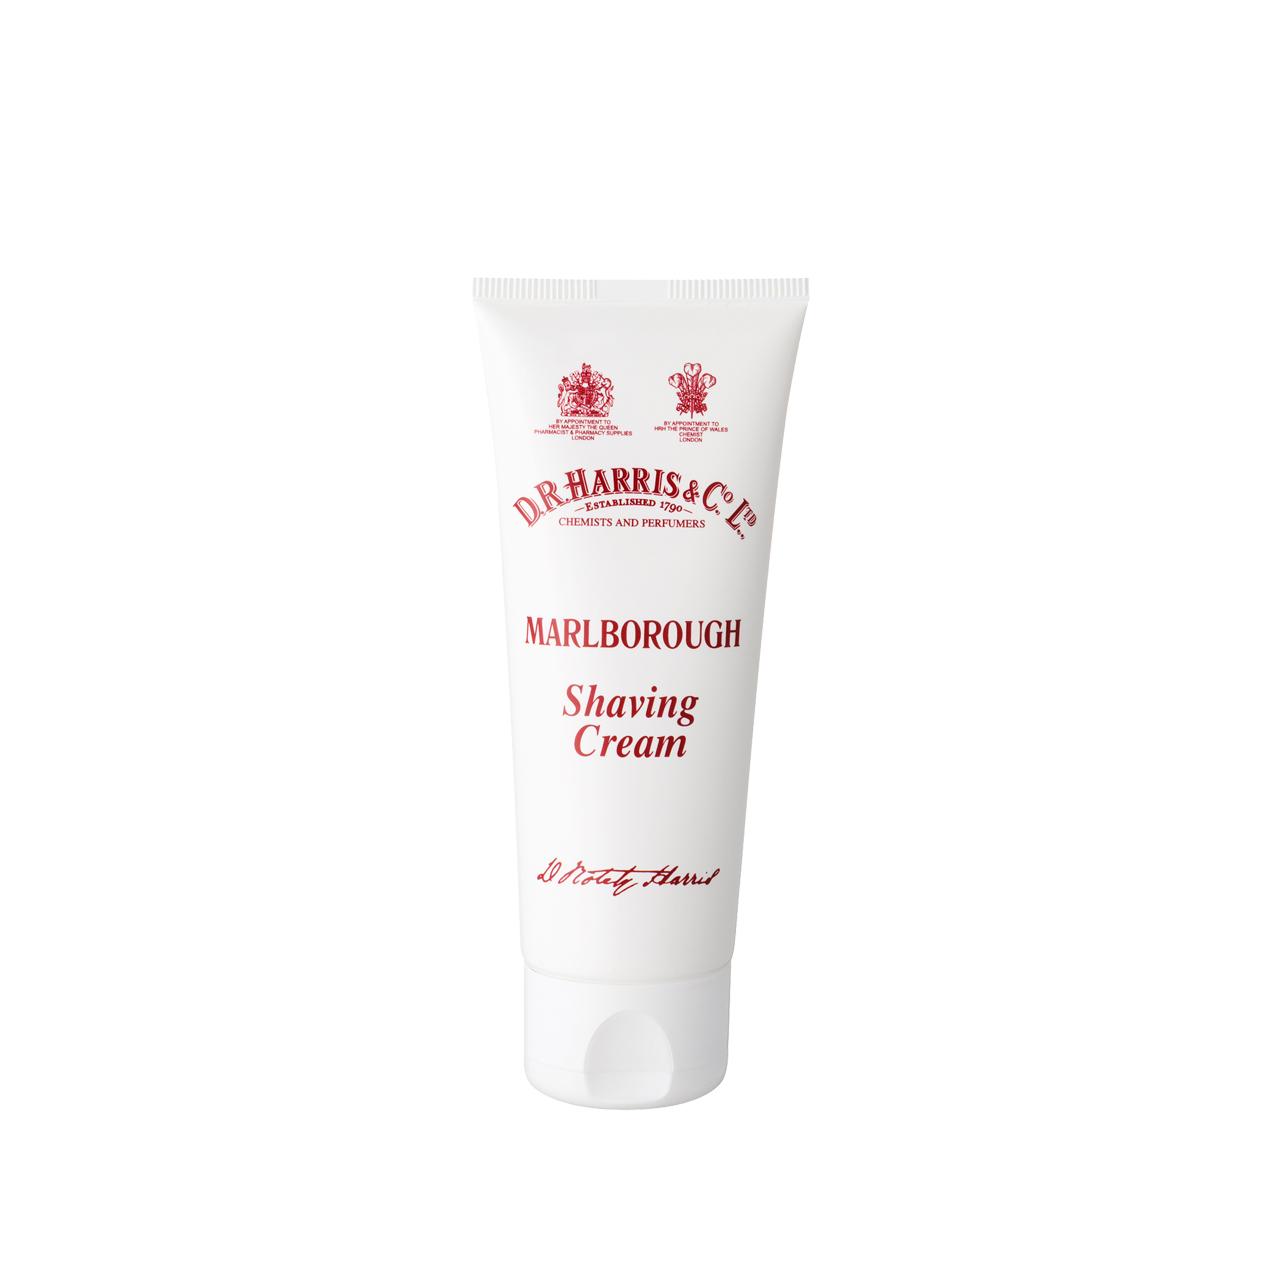 Marlborough - Shaving Cream Tube